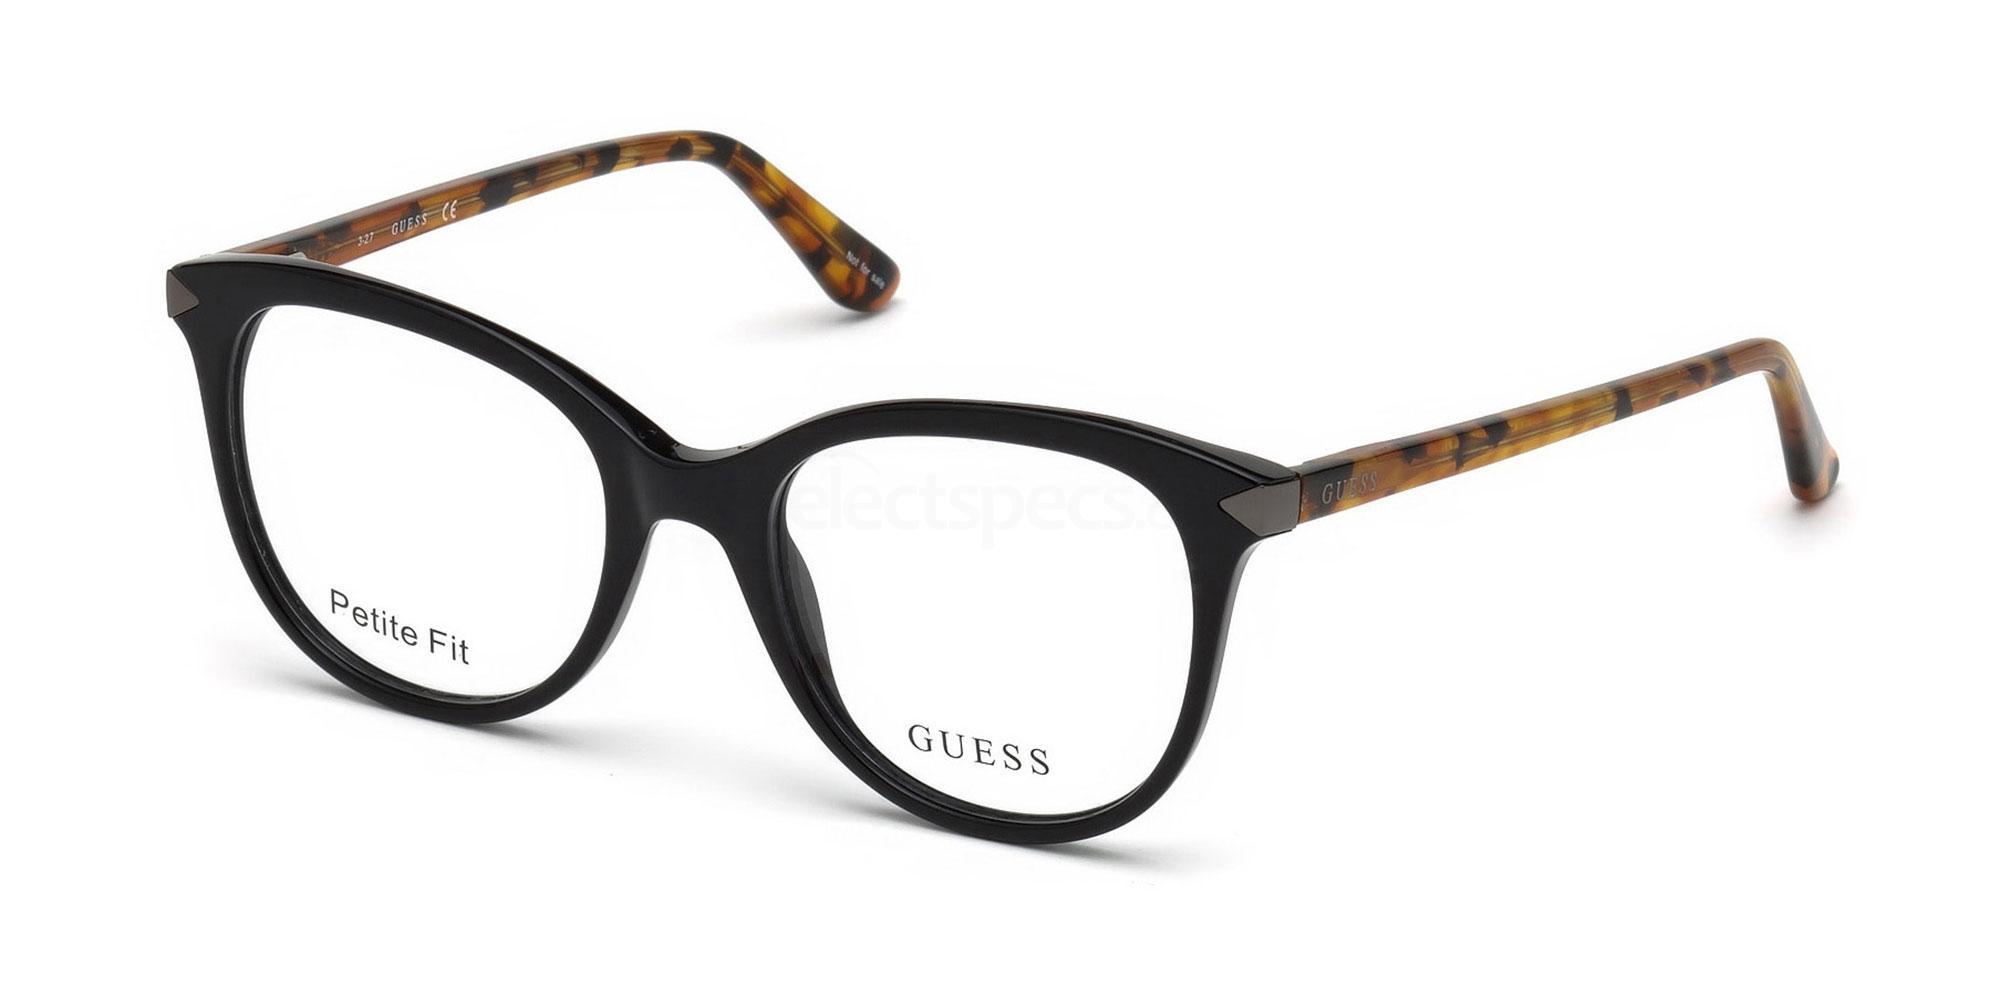 001 GU2667 Glasses, Guess